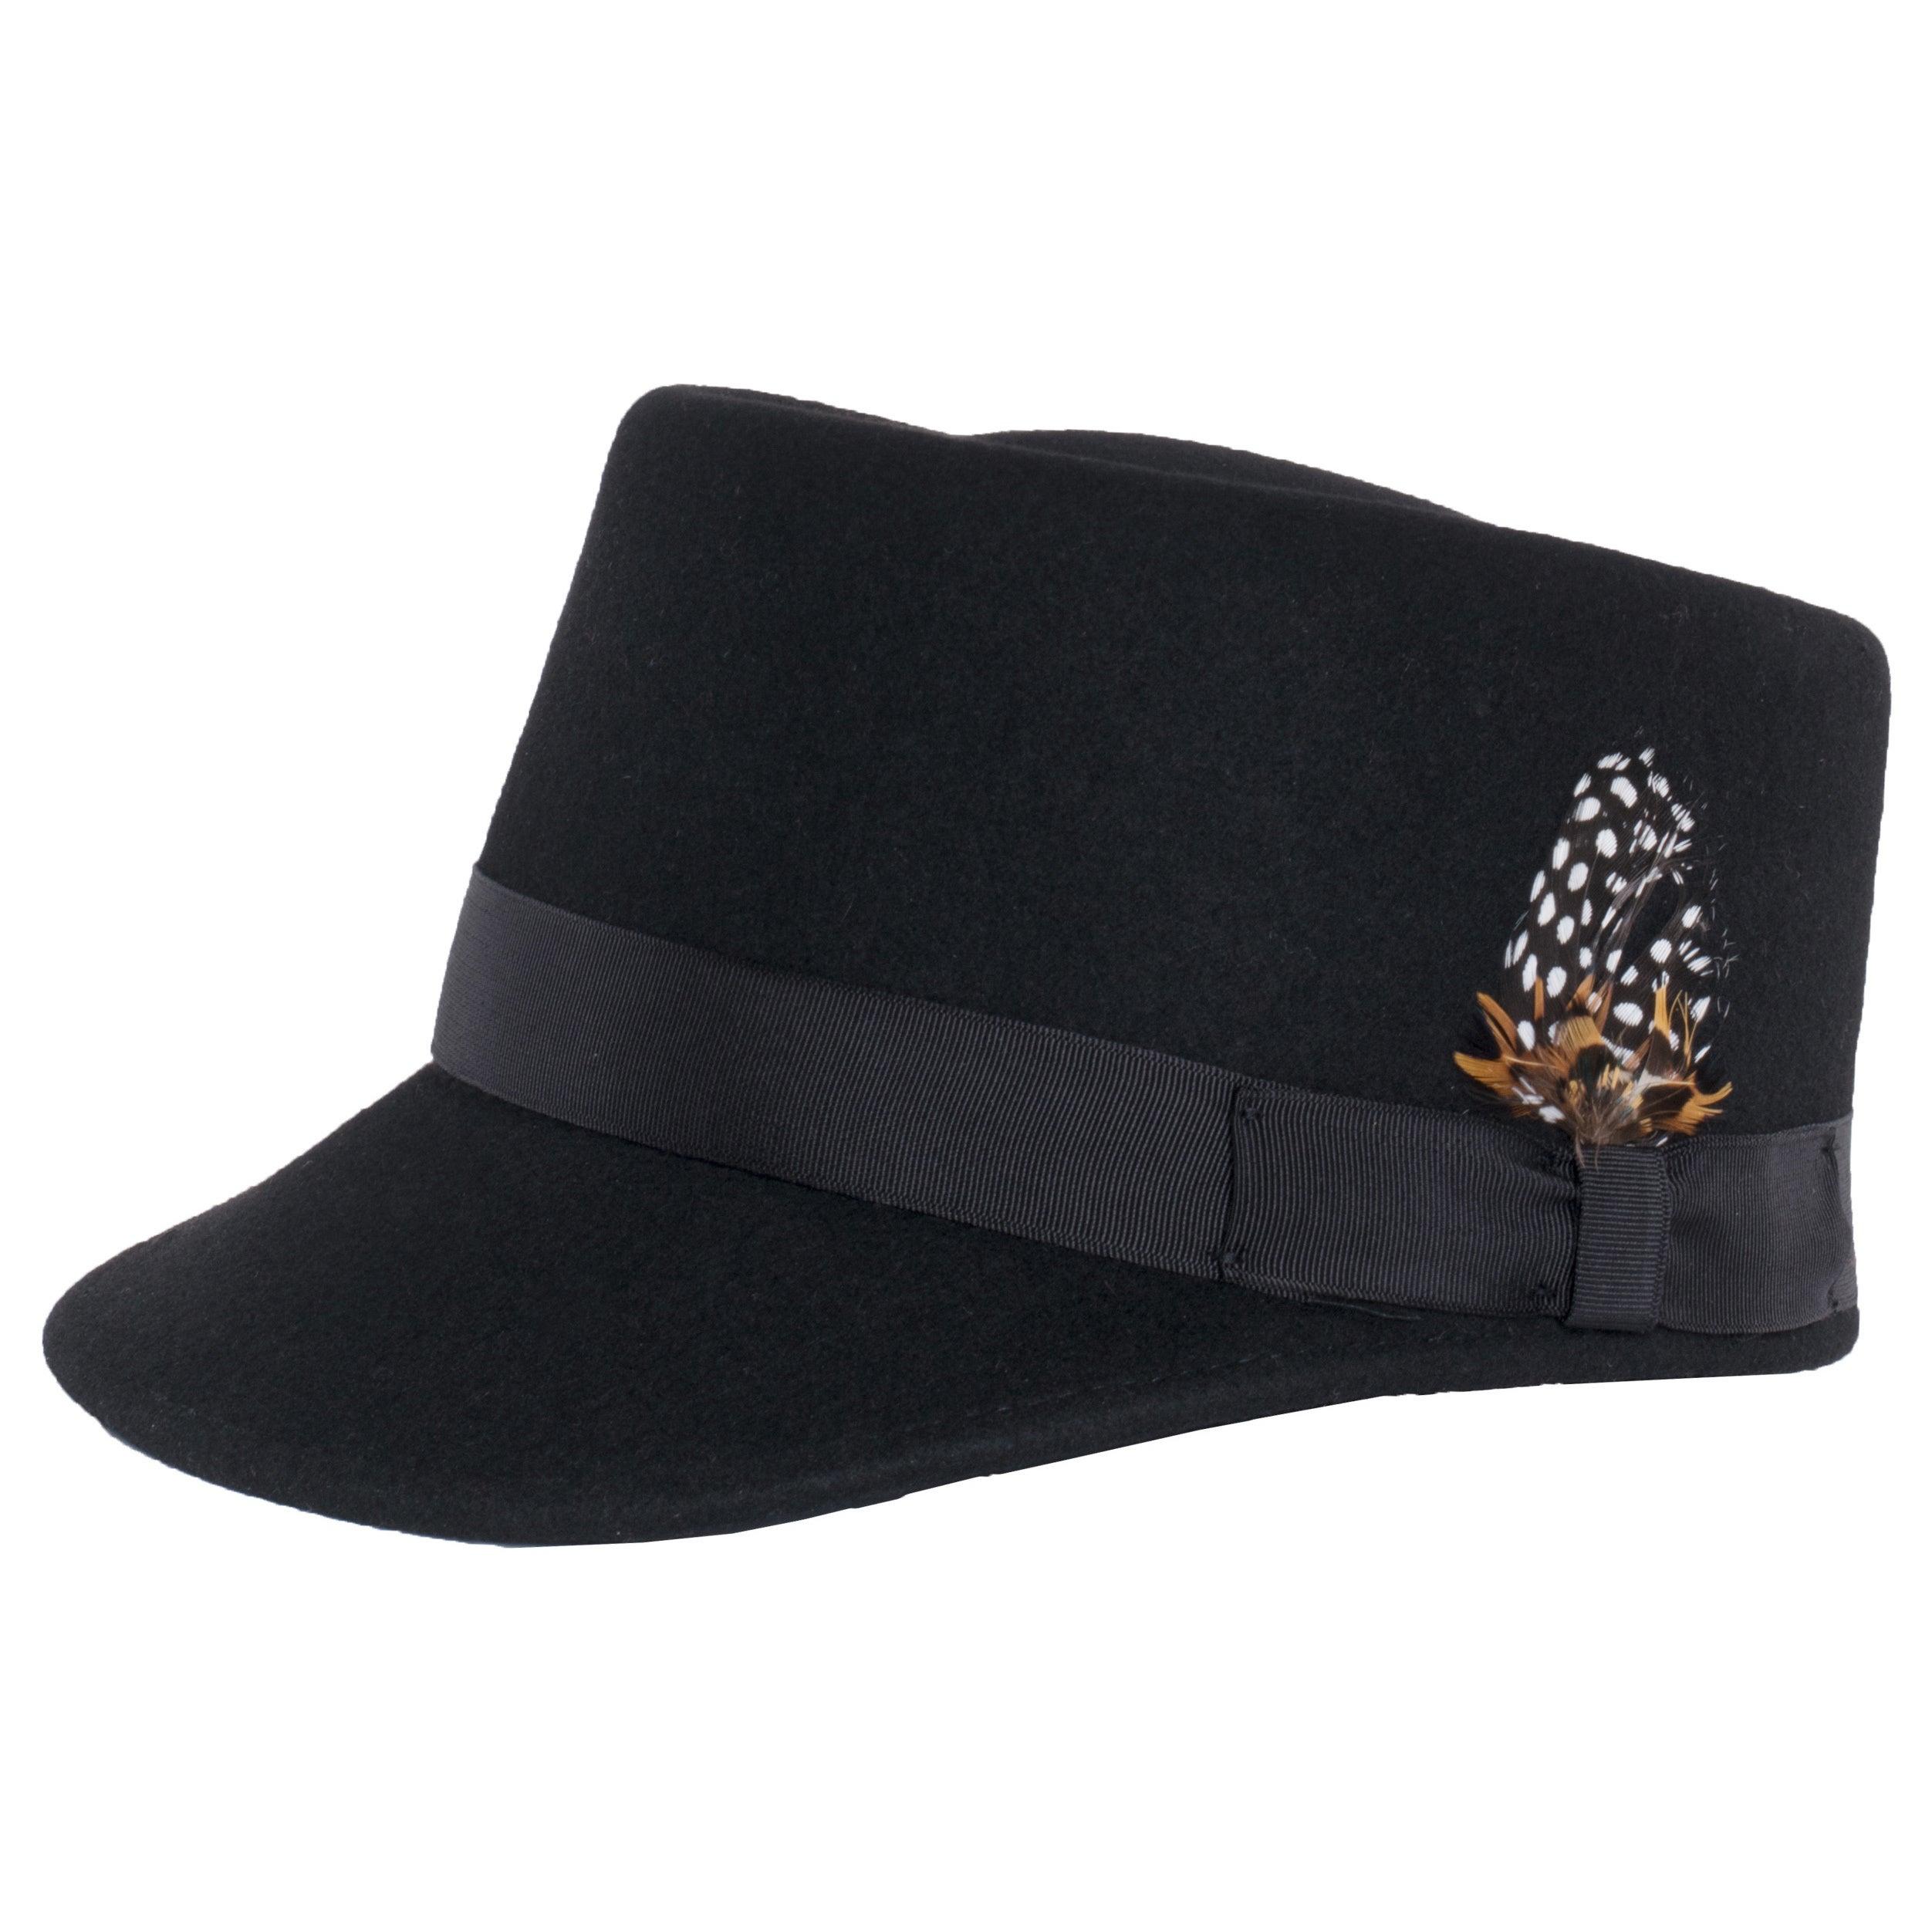 0e2bb142273 JETTING Black Red Spring Summer Sun Hat Travel Women Hat Unisex Flat Cotton Bucket  Hat For Men Women Female Male Fisherman Cap